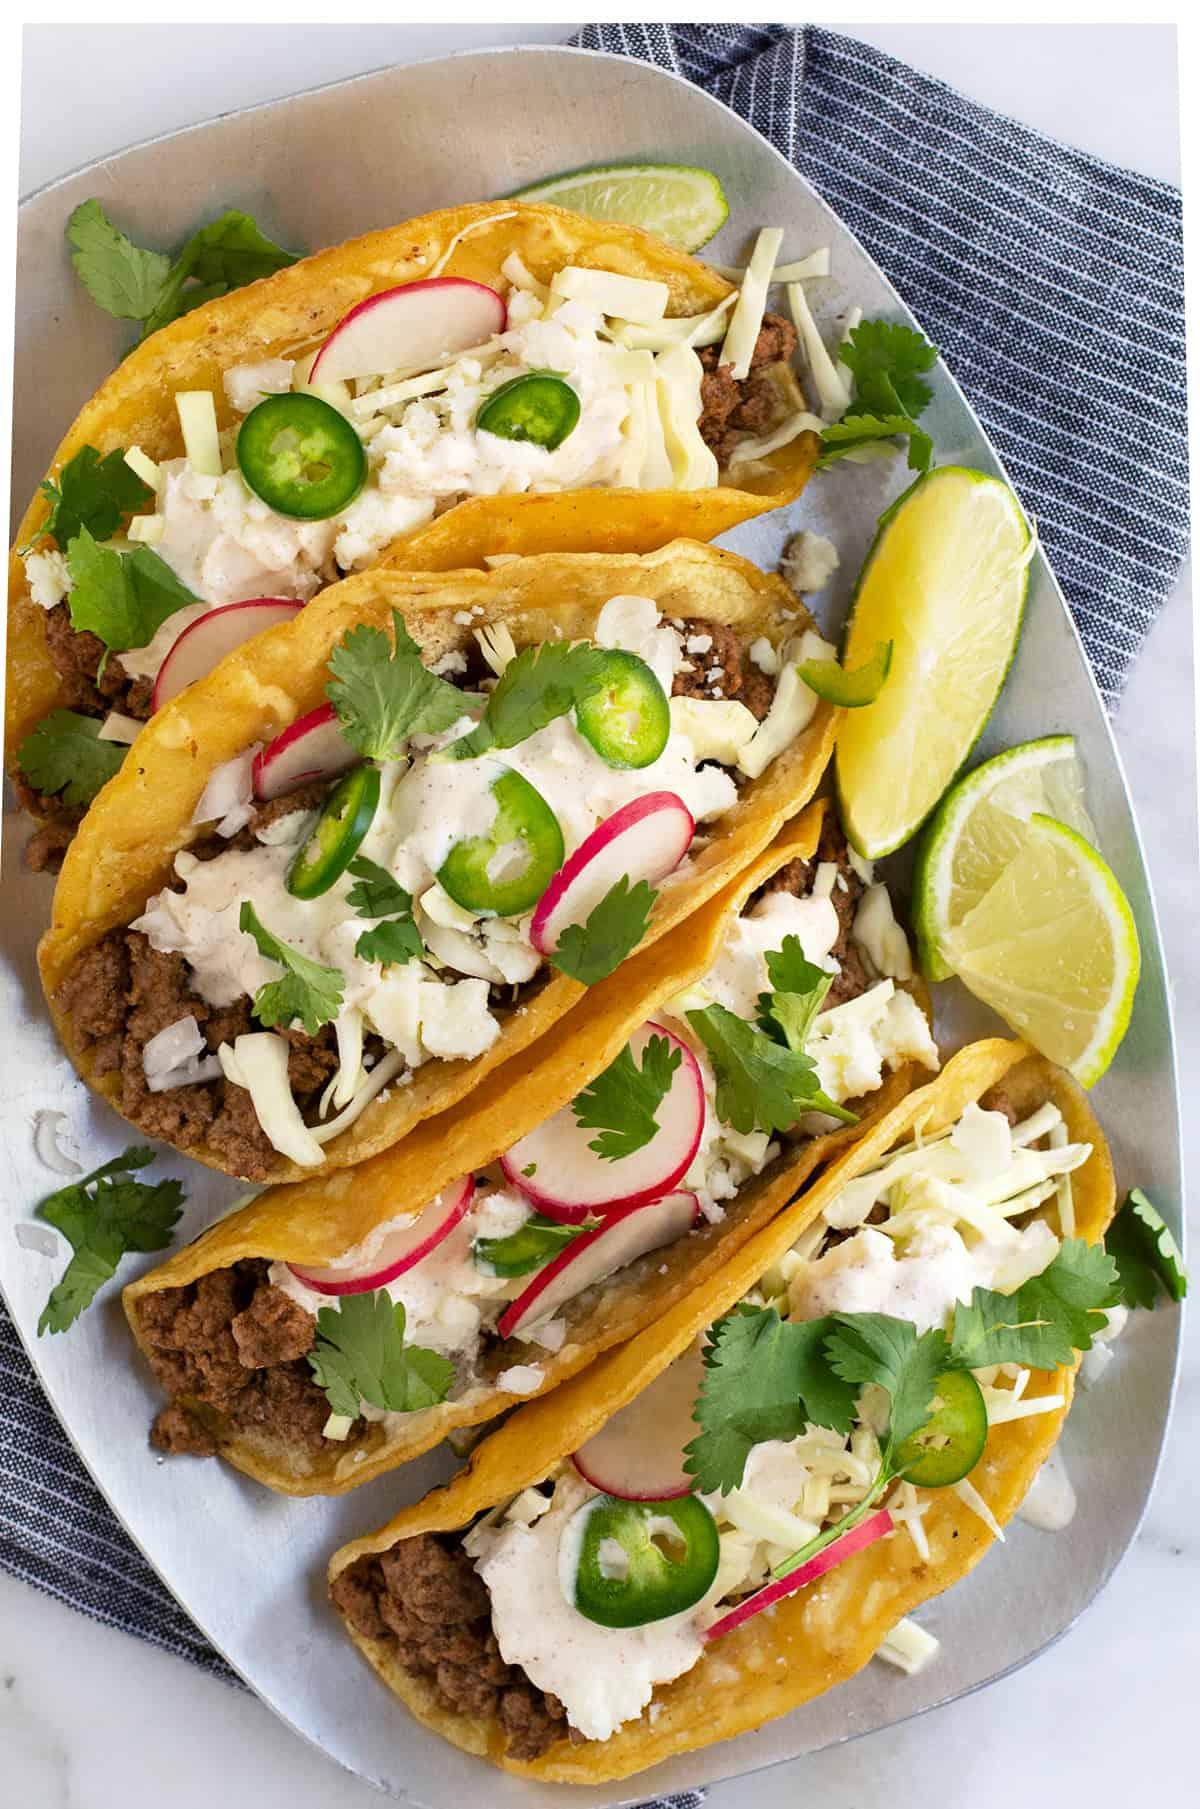 Lamb Tacos served on a steel platter